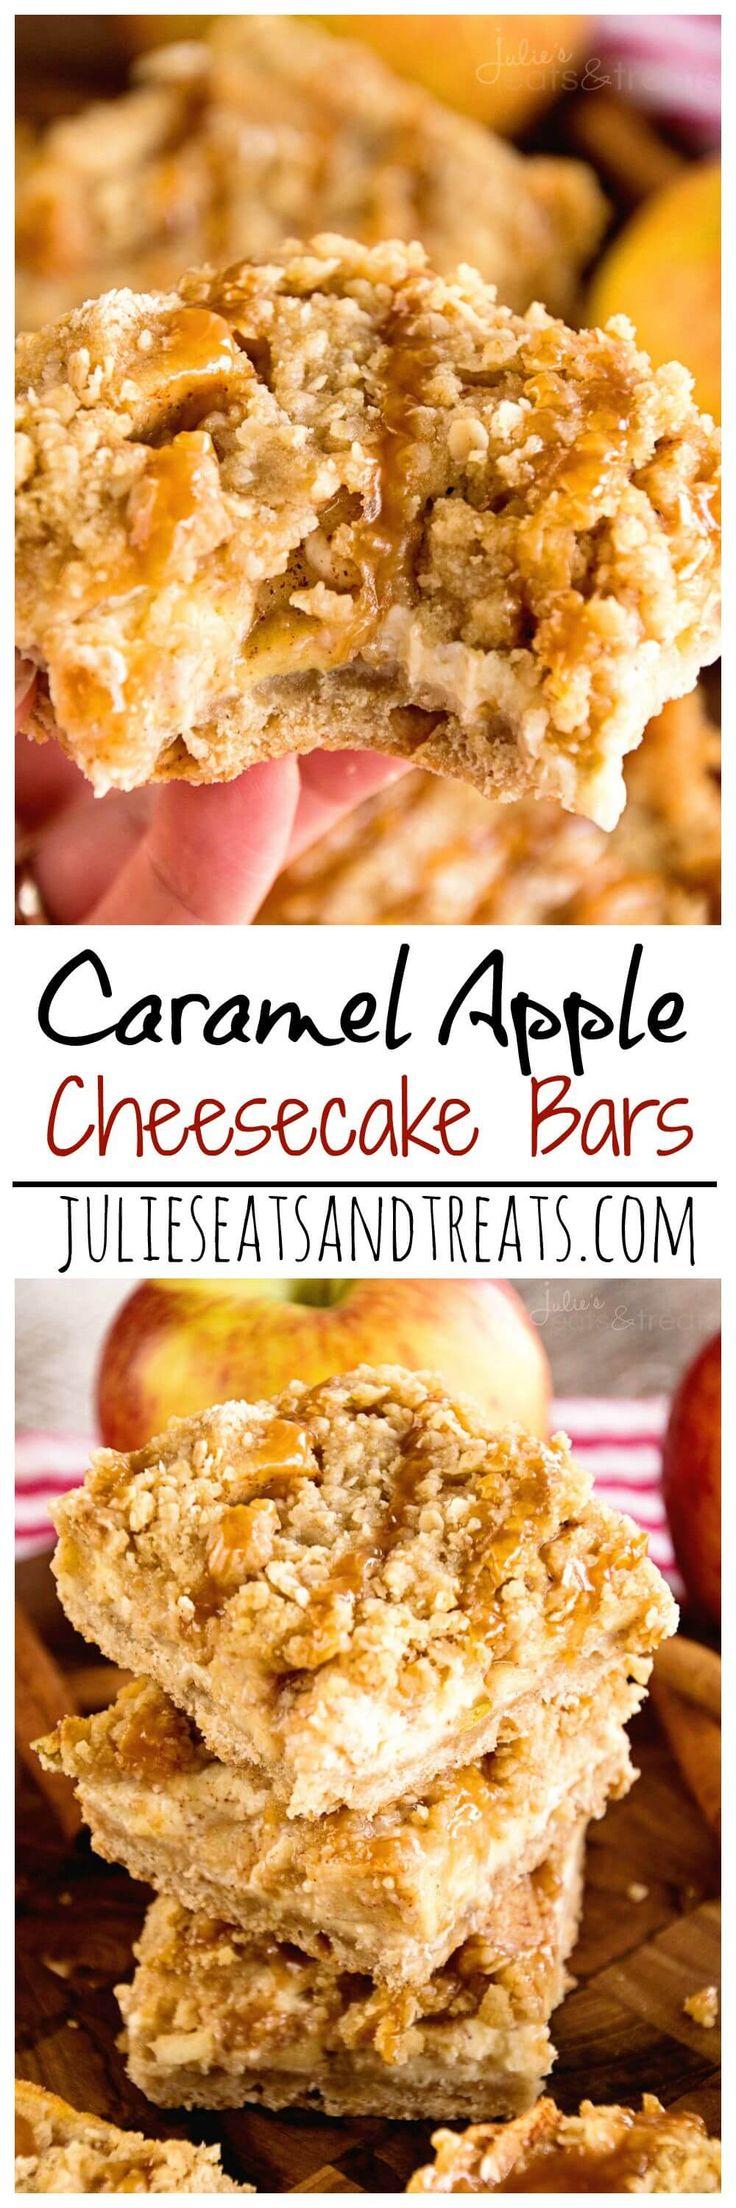 ... Bars on Pinterest | Pecan pie bars, Cheesecake bars and Sugar cookie